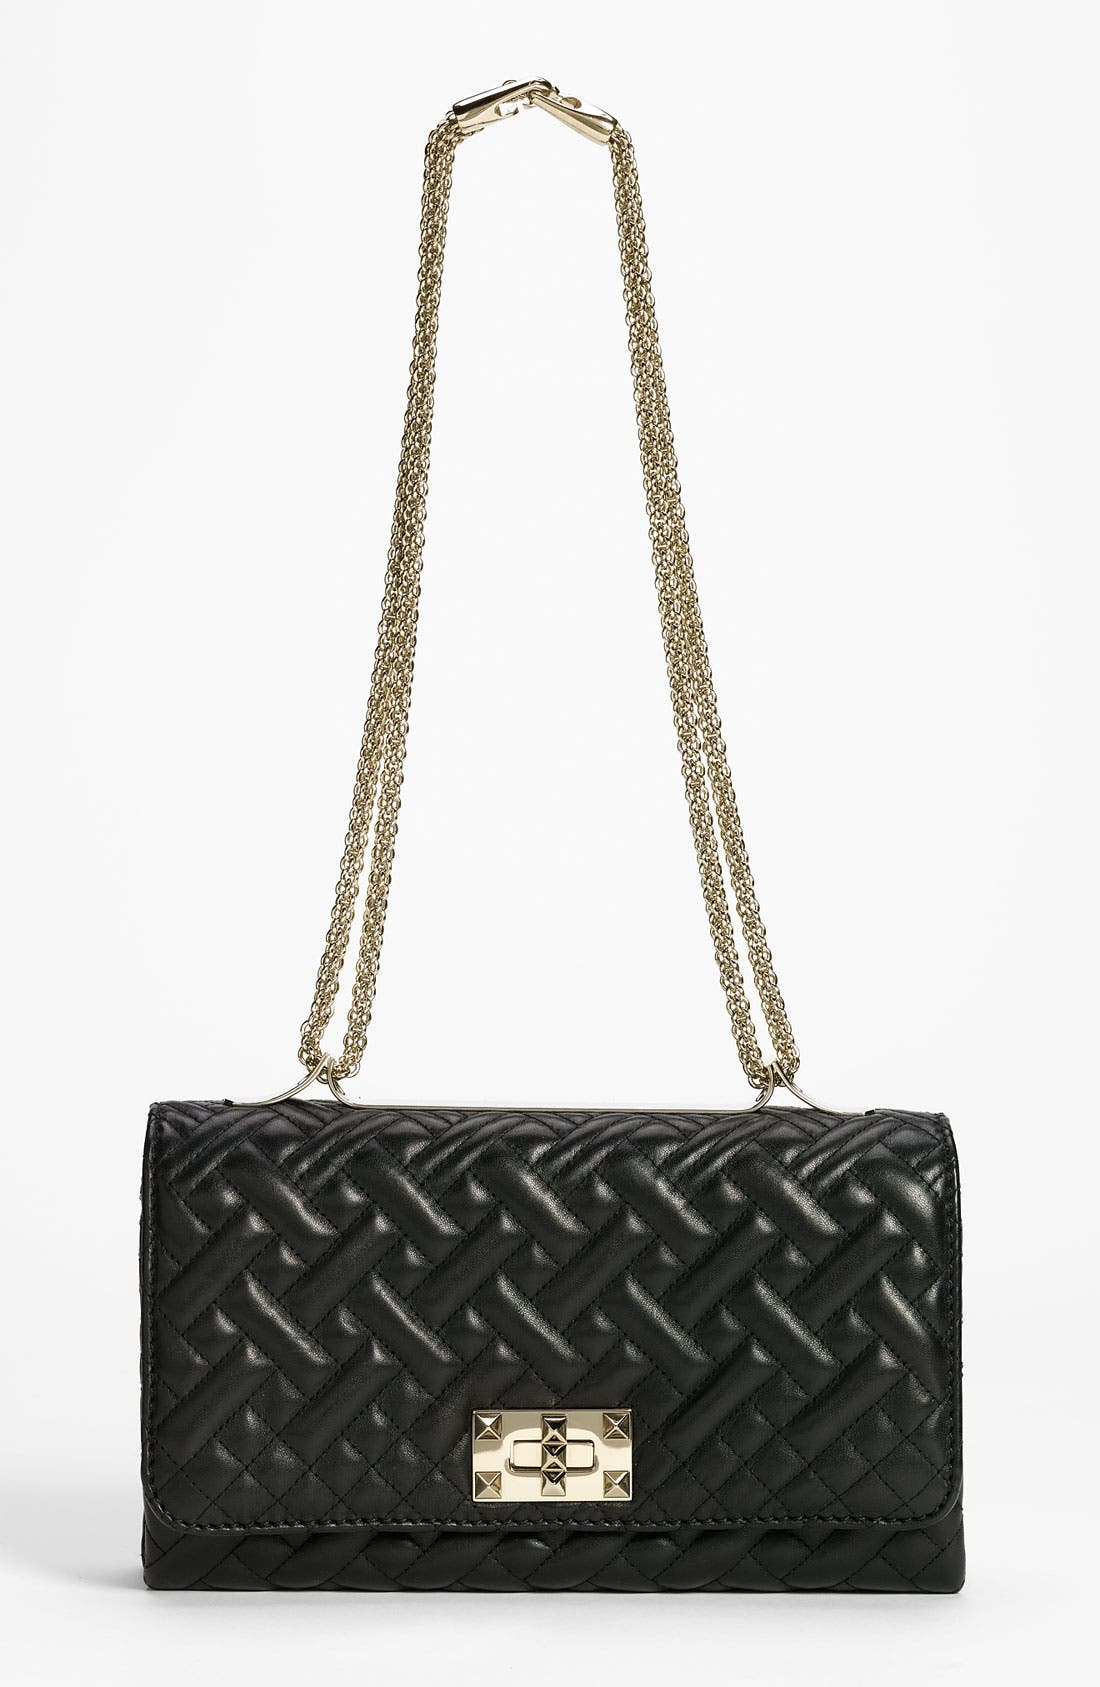 Main Image - Valentino 'Girello Flap - Small' Leather Shoulder Bag